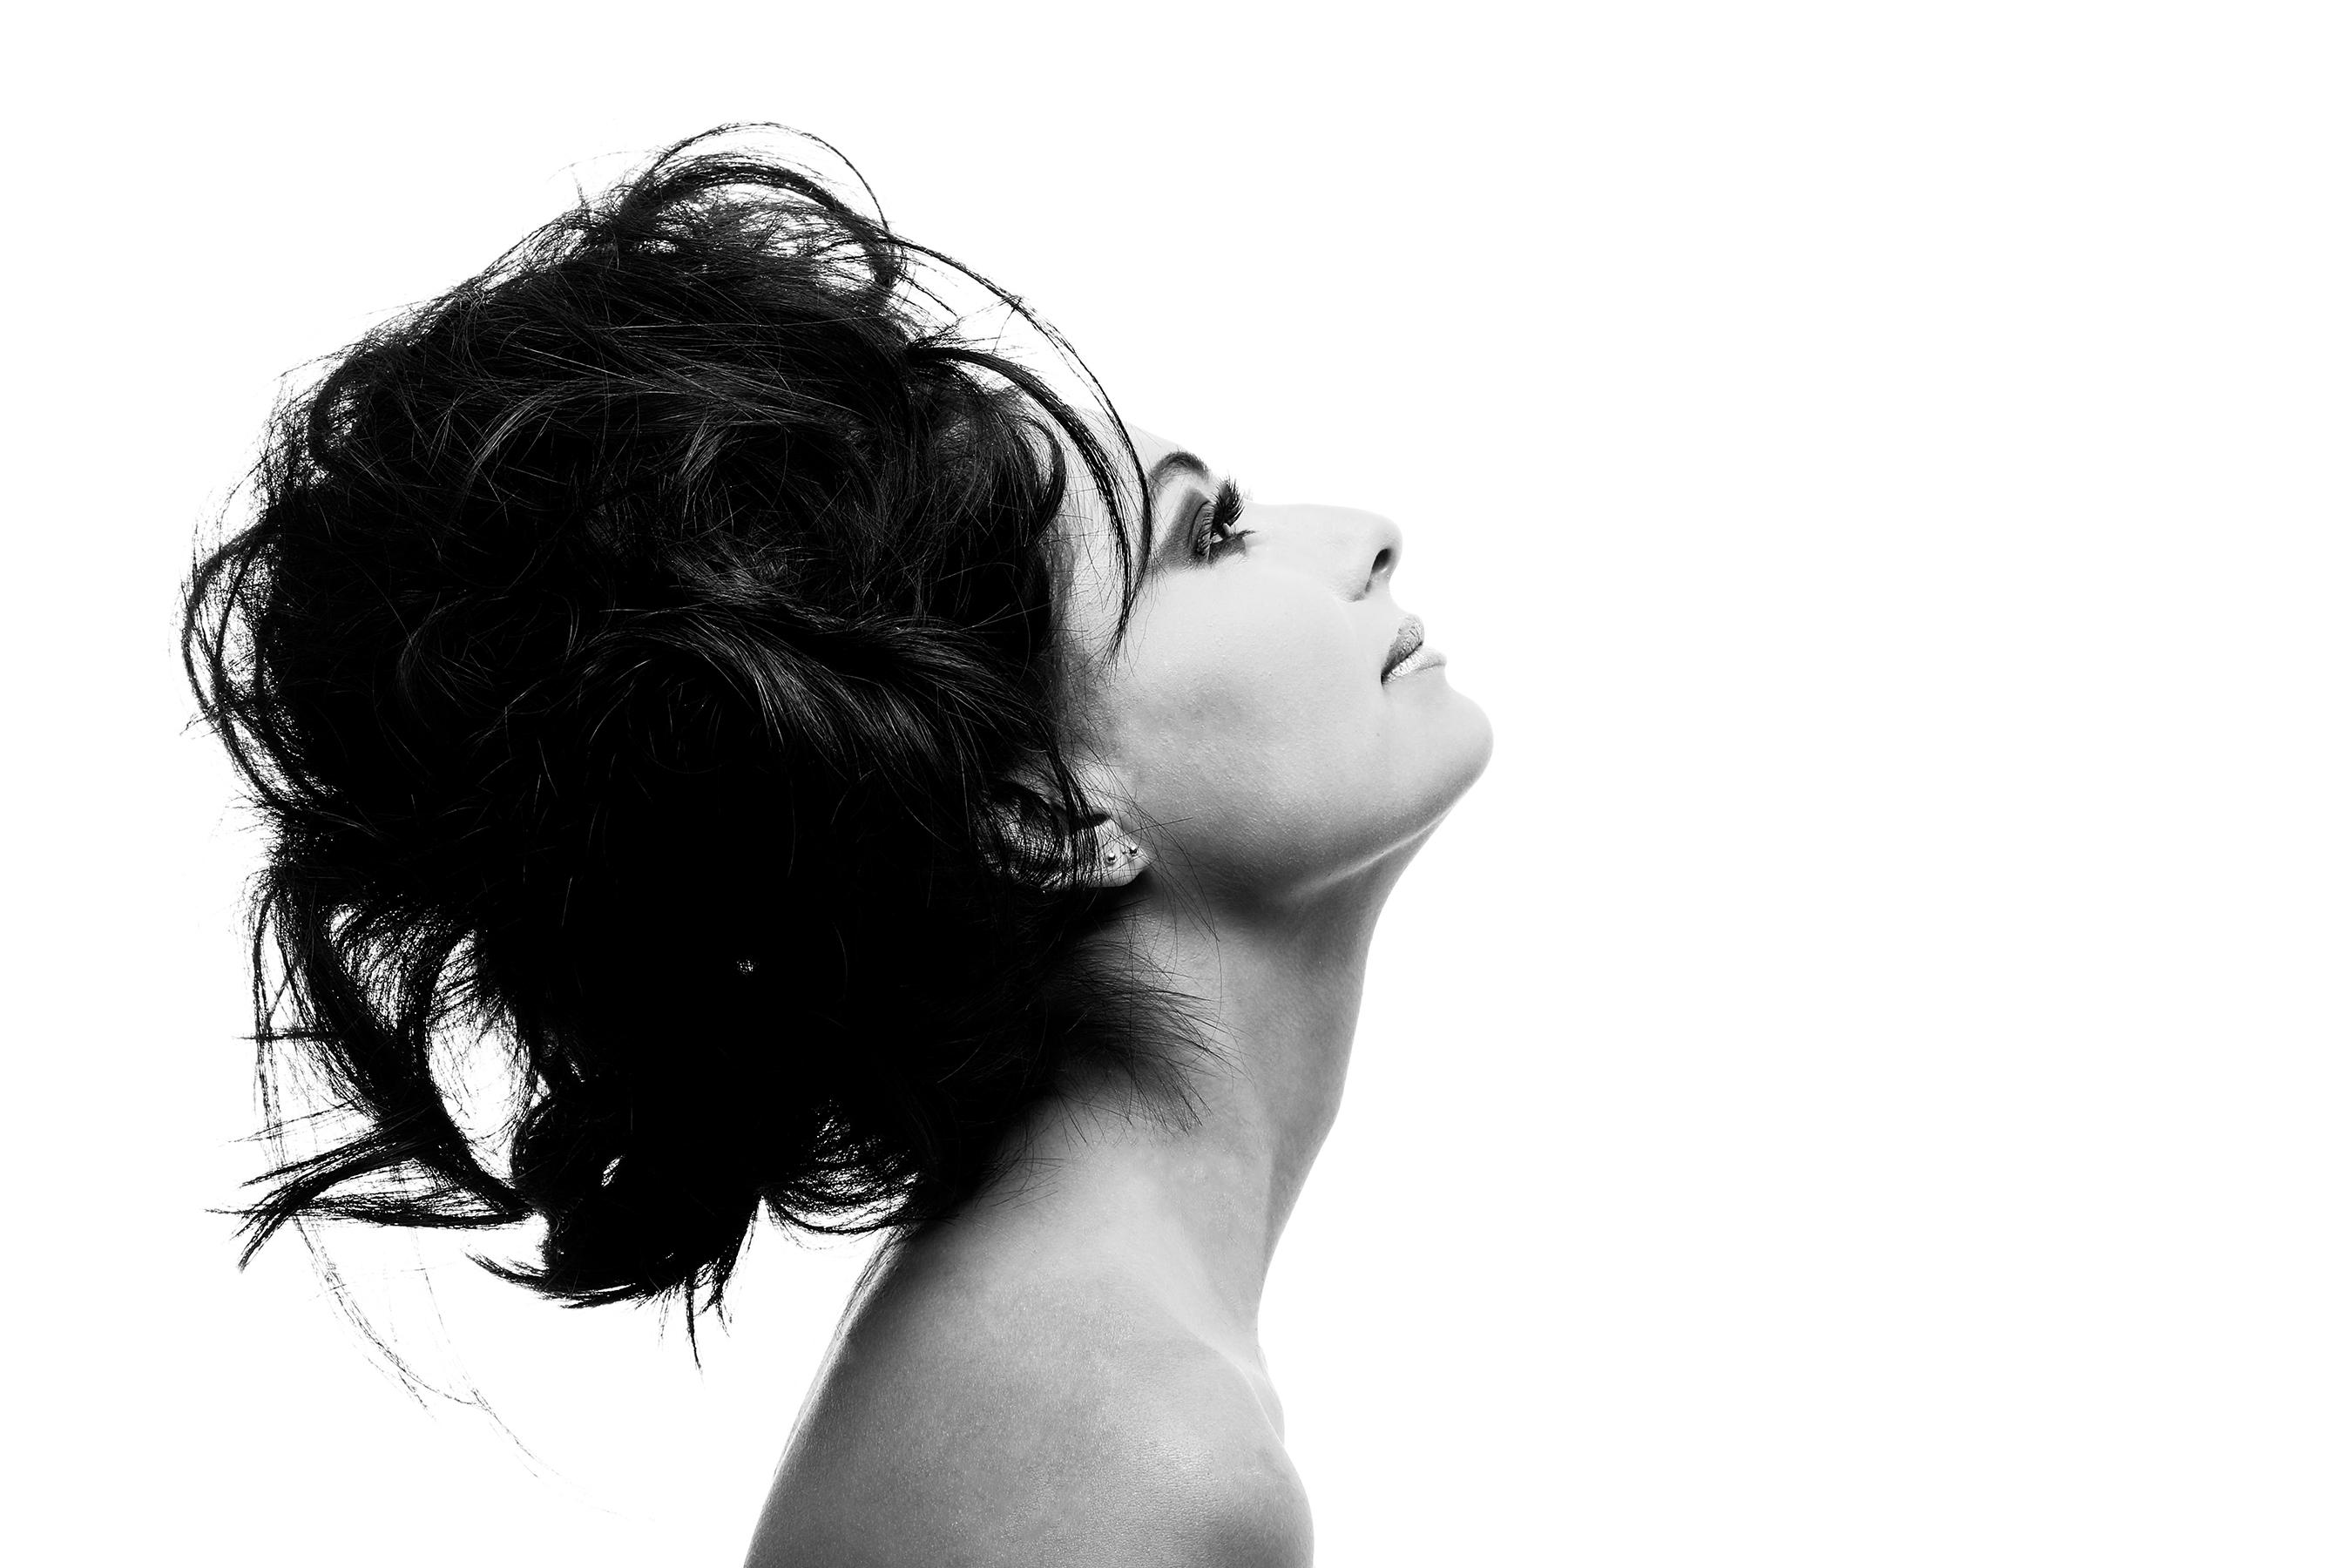 Wendy Arellano foto digital 8 trimestre.